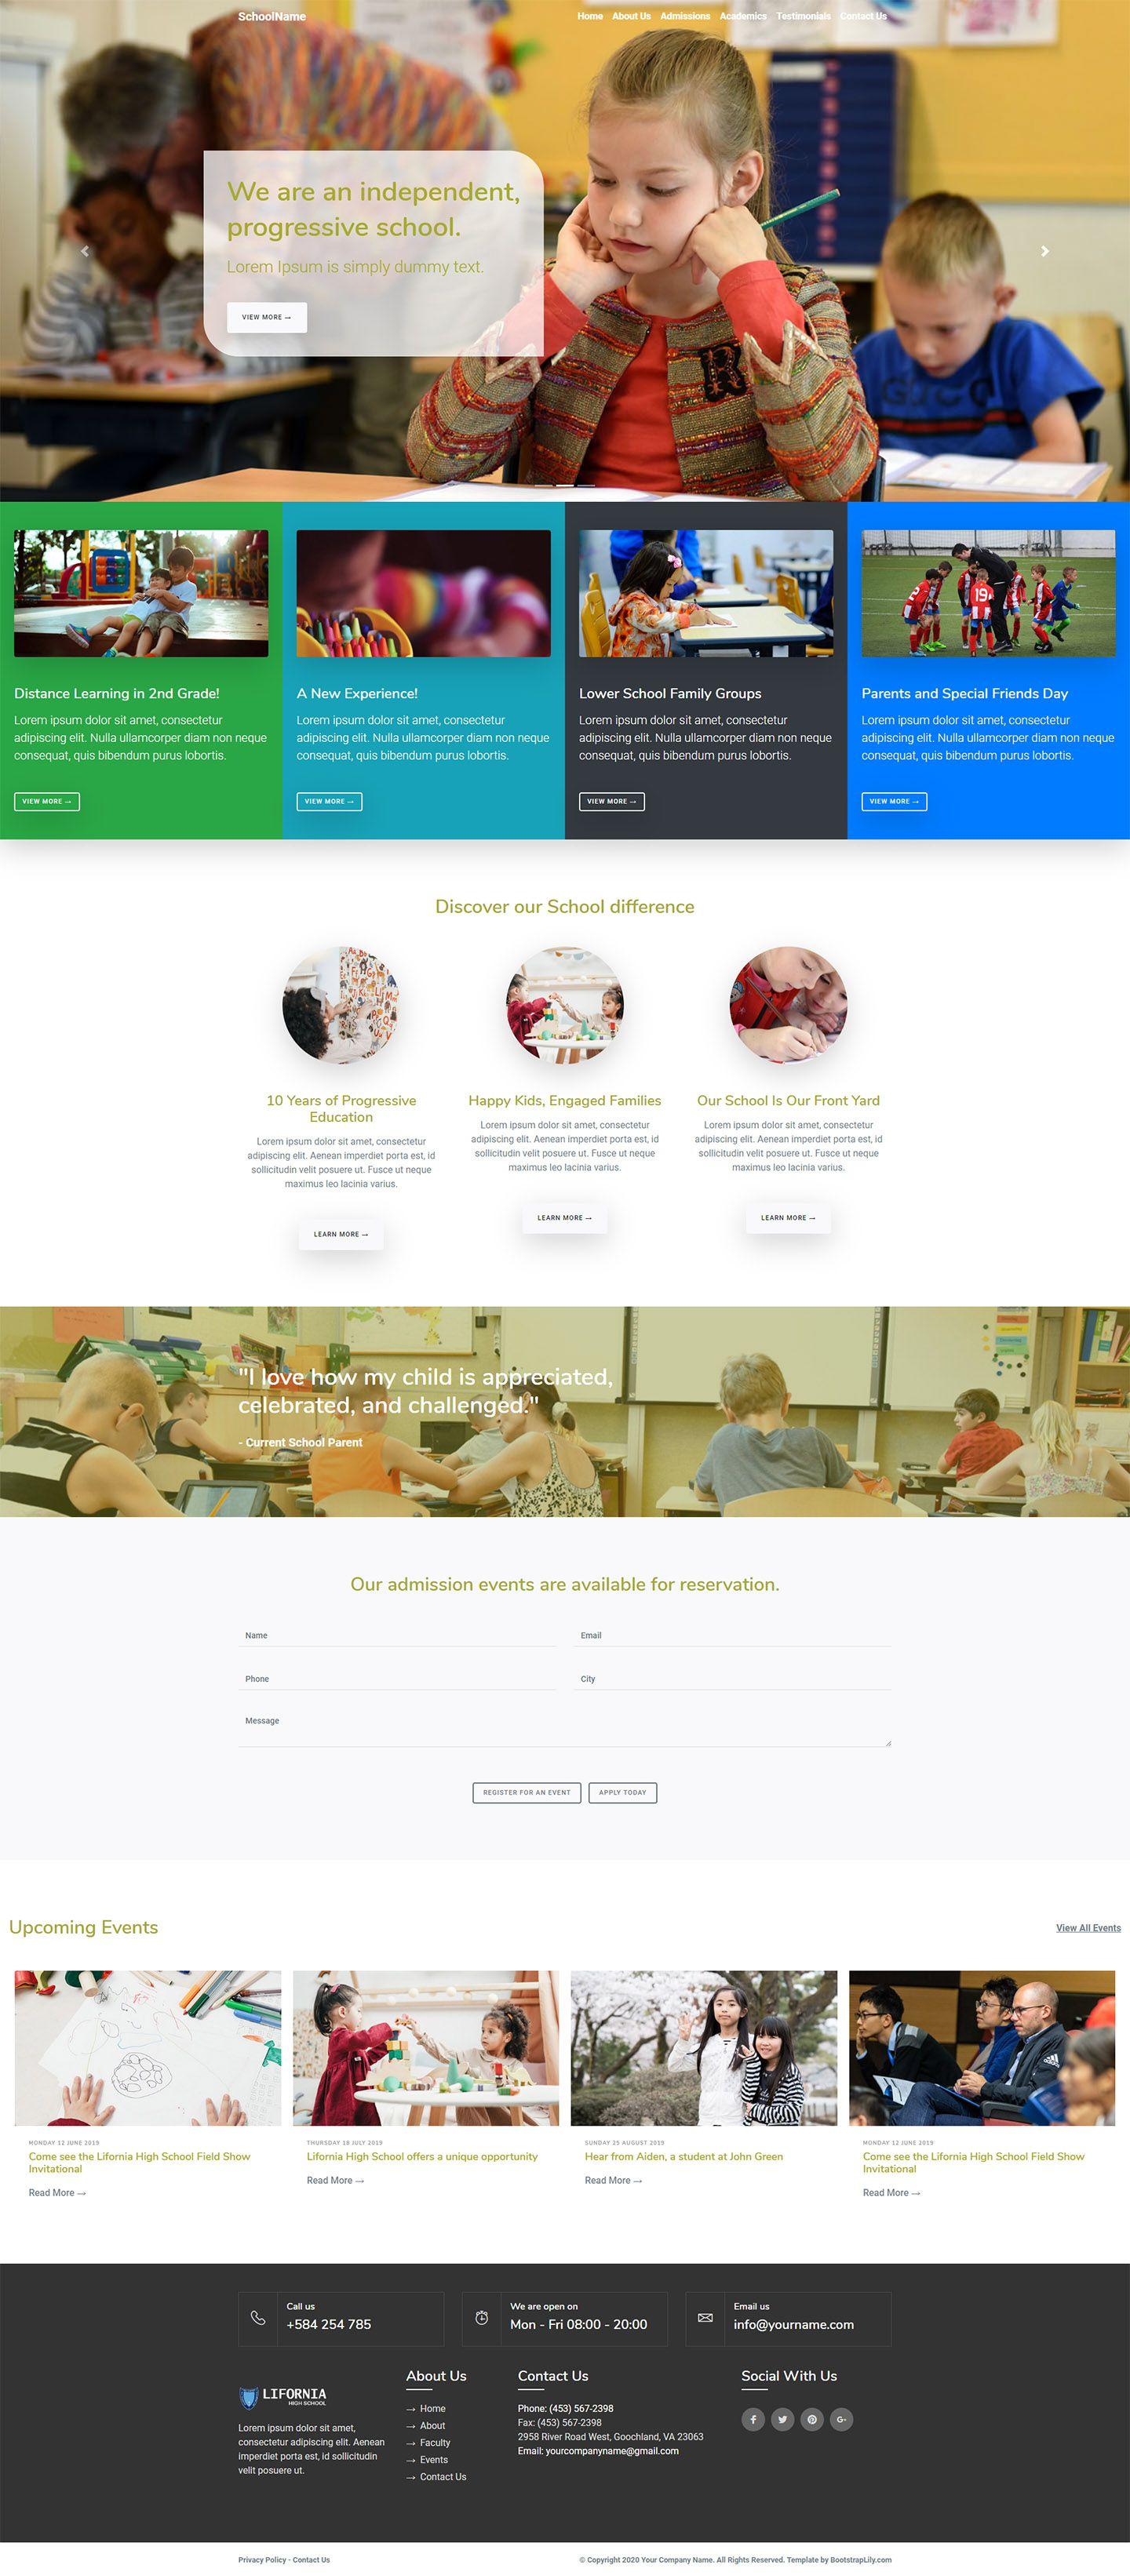 Free bootstrap school template in 2020 School template